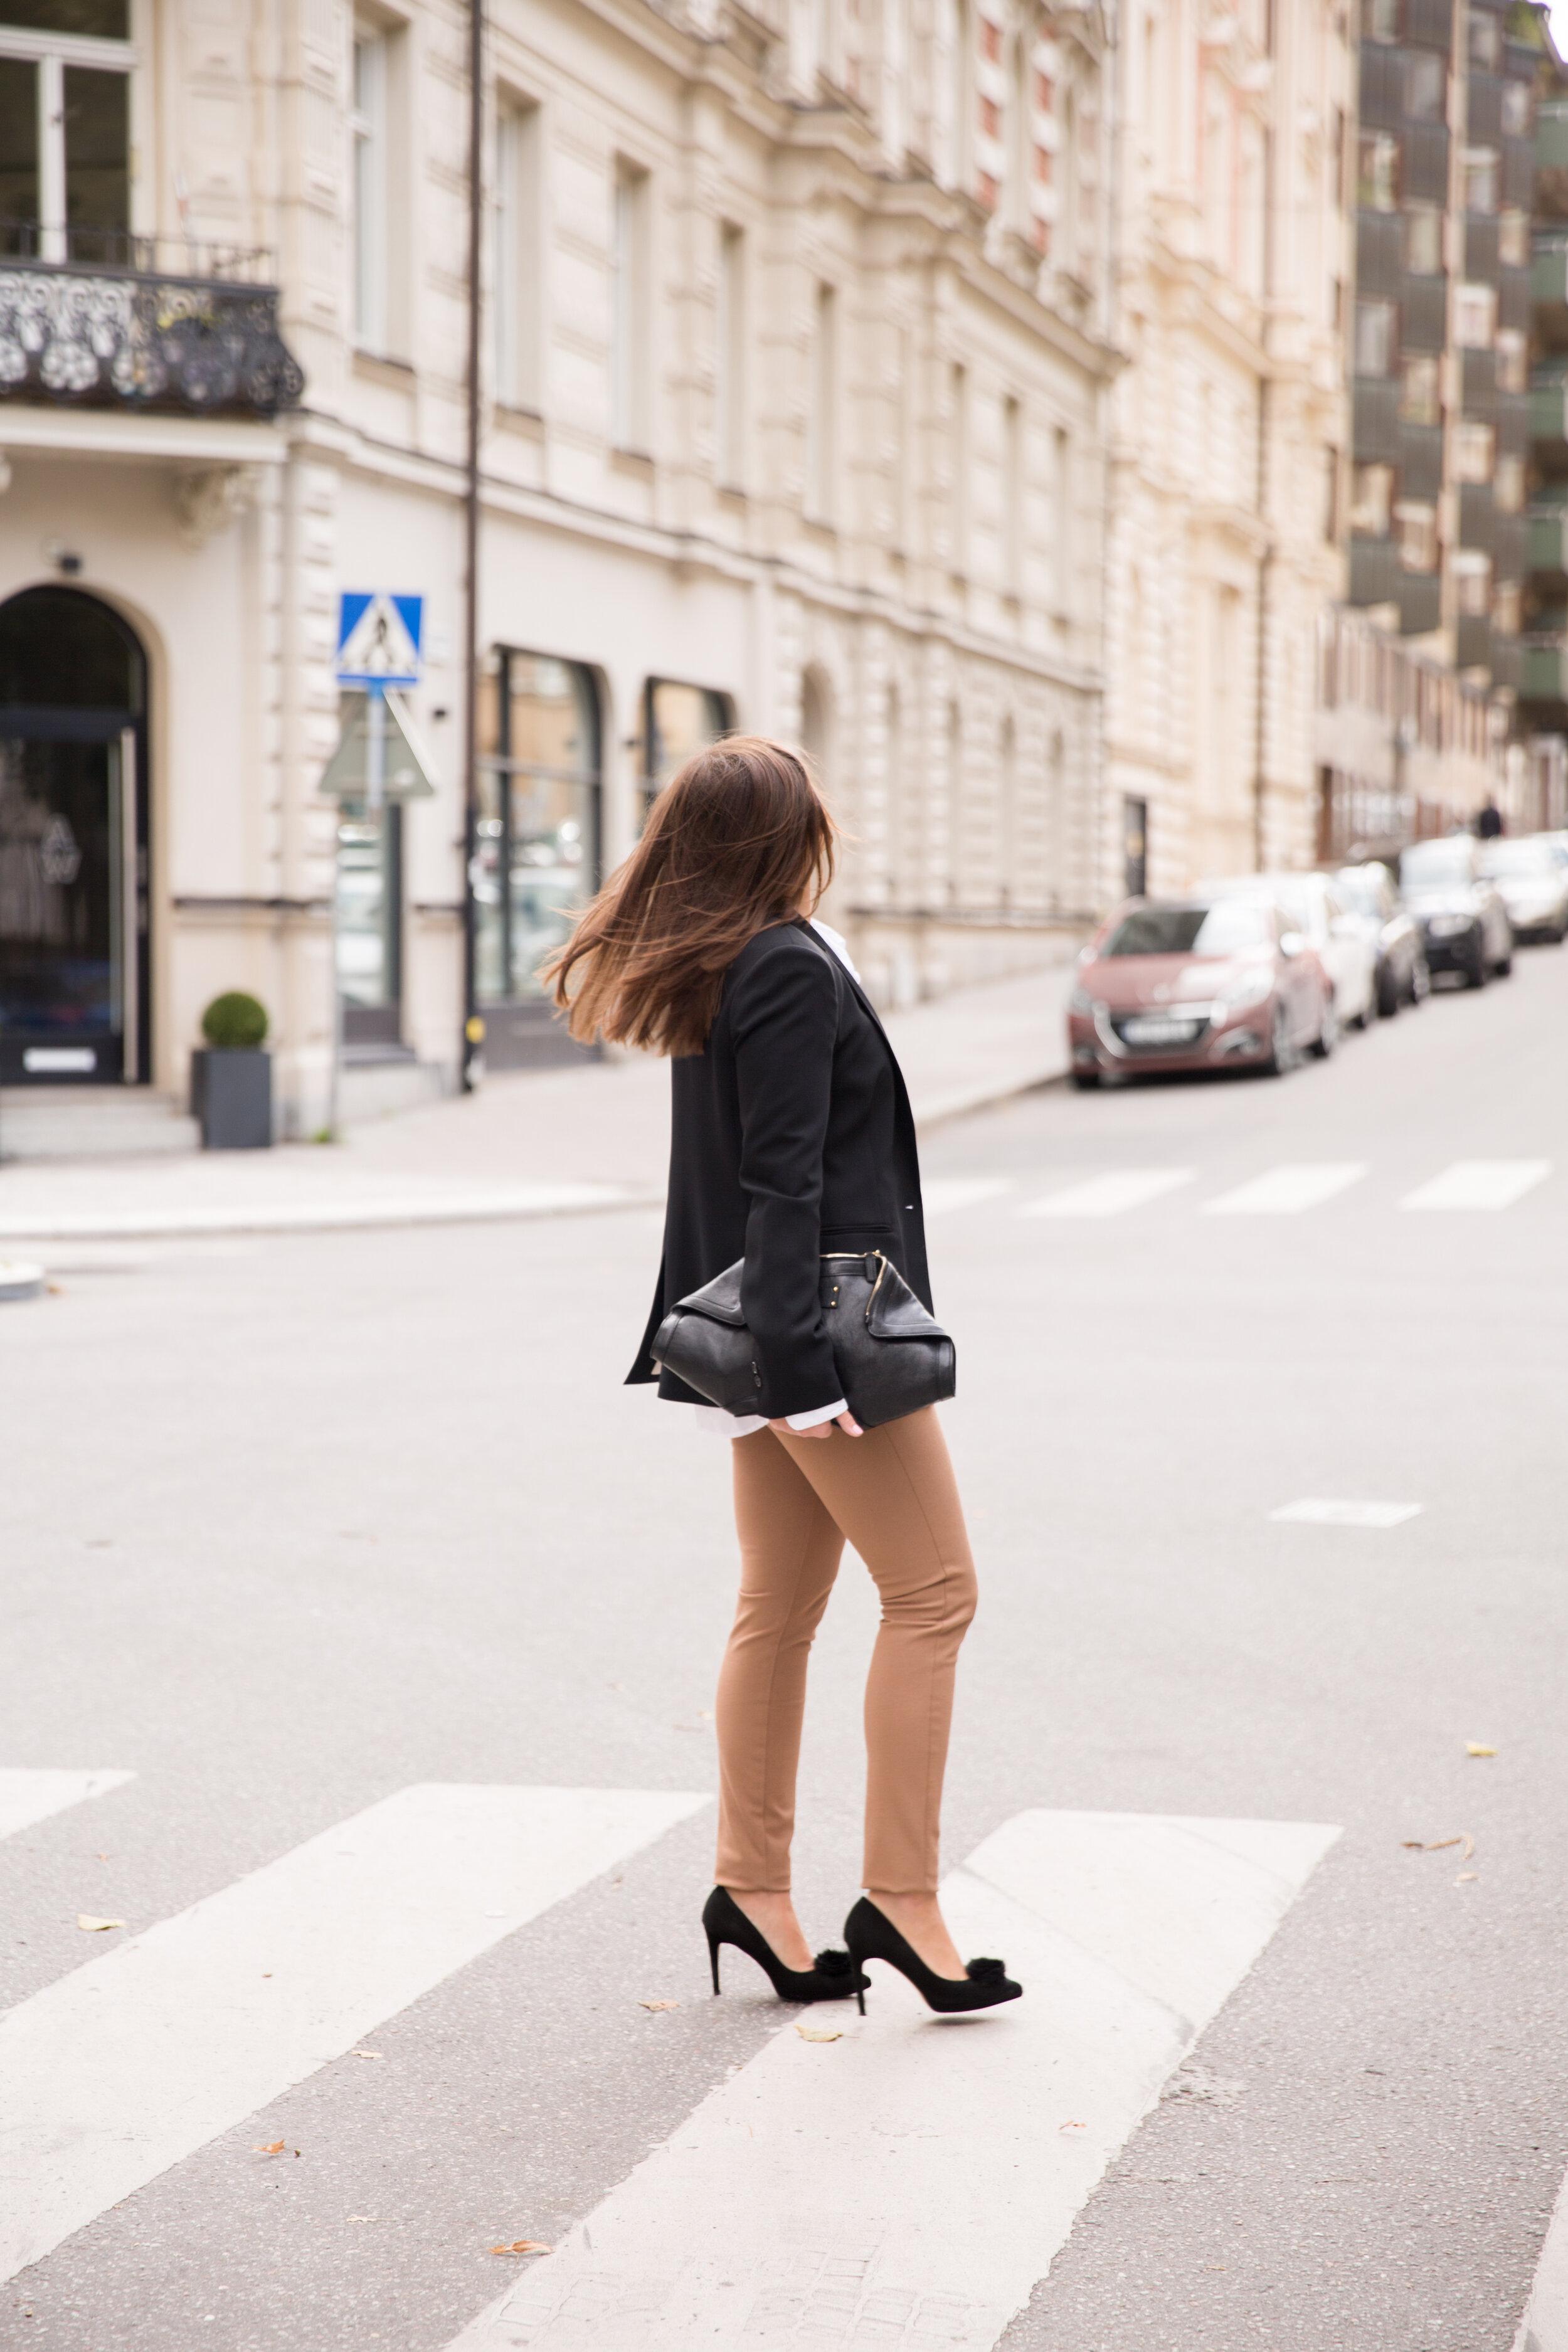 Angelica Aurell mode stil.jpg